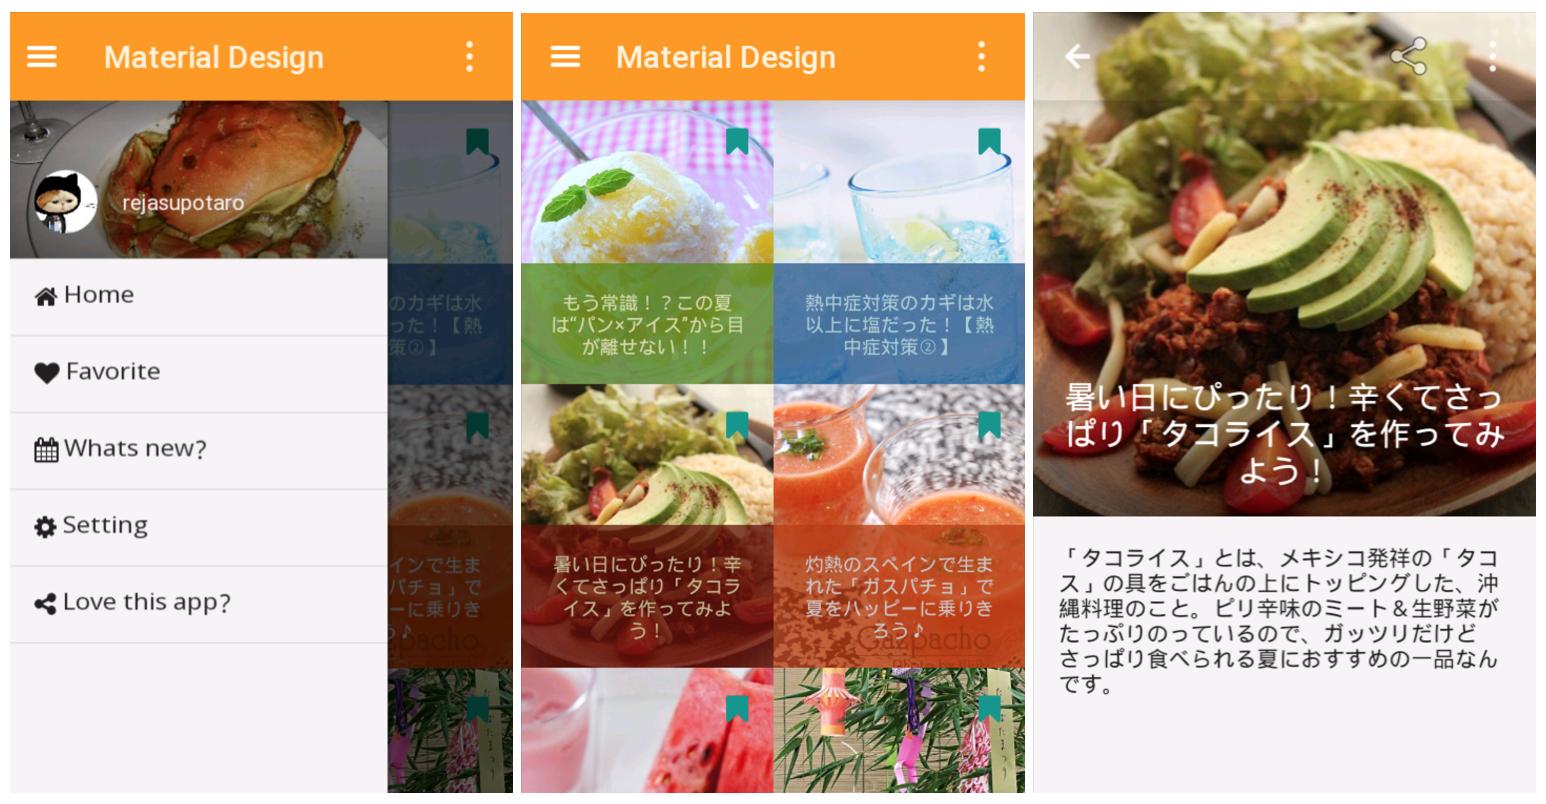 MaterialDesignSample-a.png